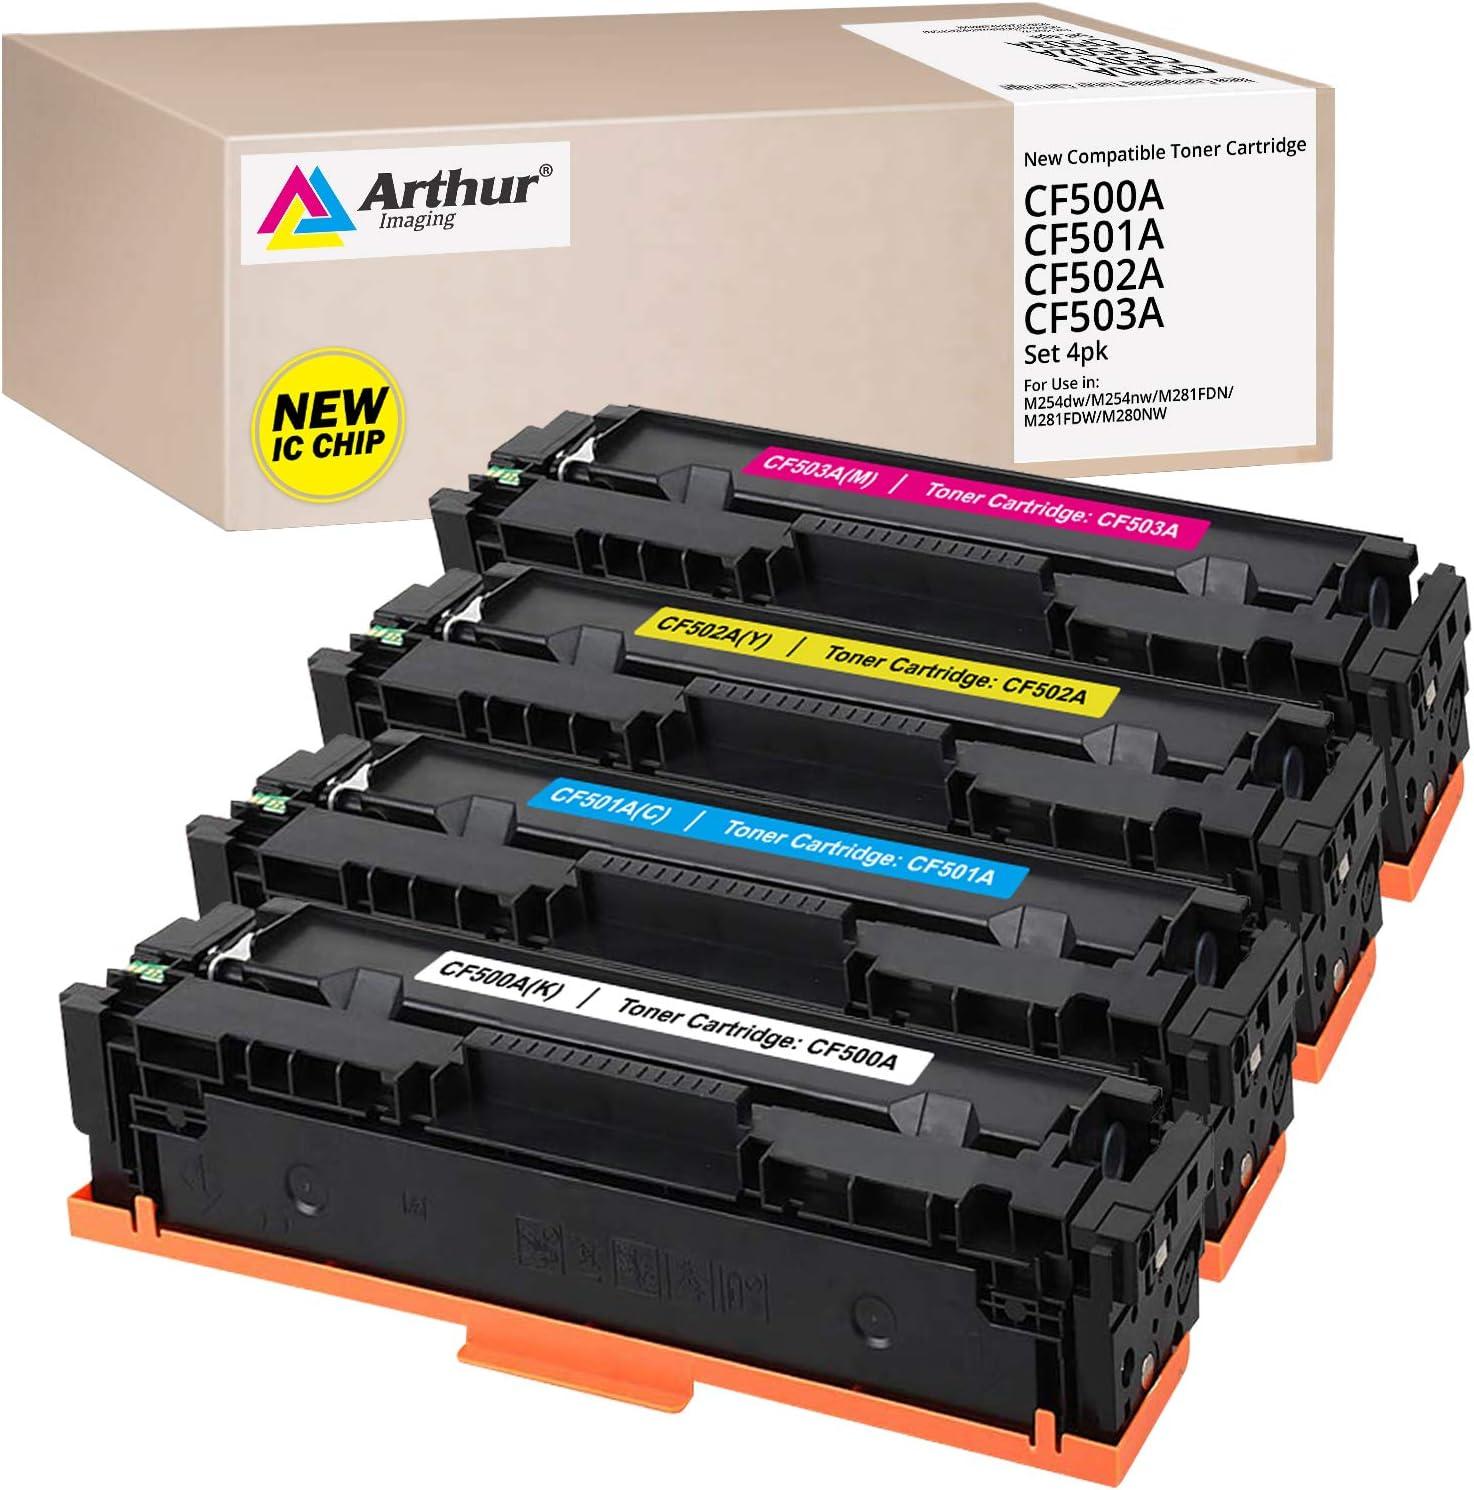 Arthur Imaging Compatible Toner Cartridge for HP 202X CF500A CF500X 202A HP M281fdw M254dw HP Color Laserjet Pro MFP M281fdw M281cdw M254dw M254dn M254nw M280 M281 CF500X CF501X CF502X CF503X Printer